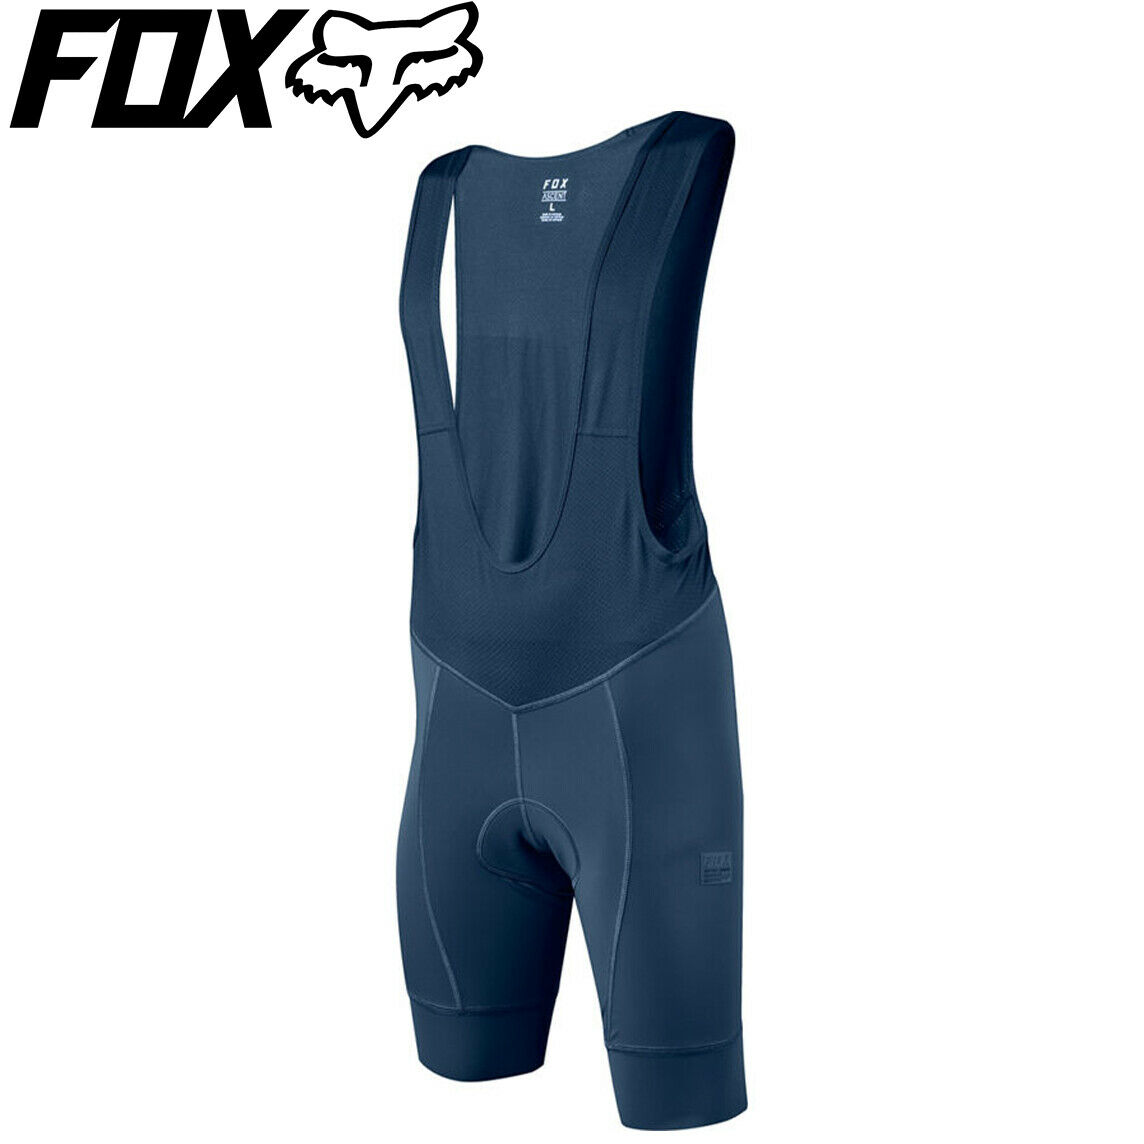 Fox Racing Ascent Bib Shorts 2018  Light Indigo blu  Dimensiones L, XL